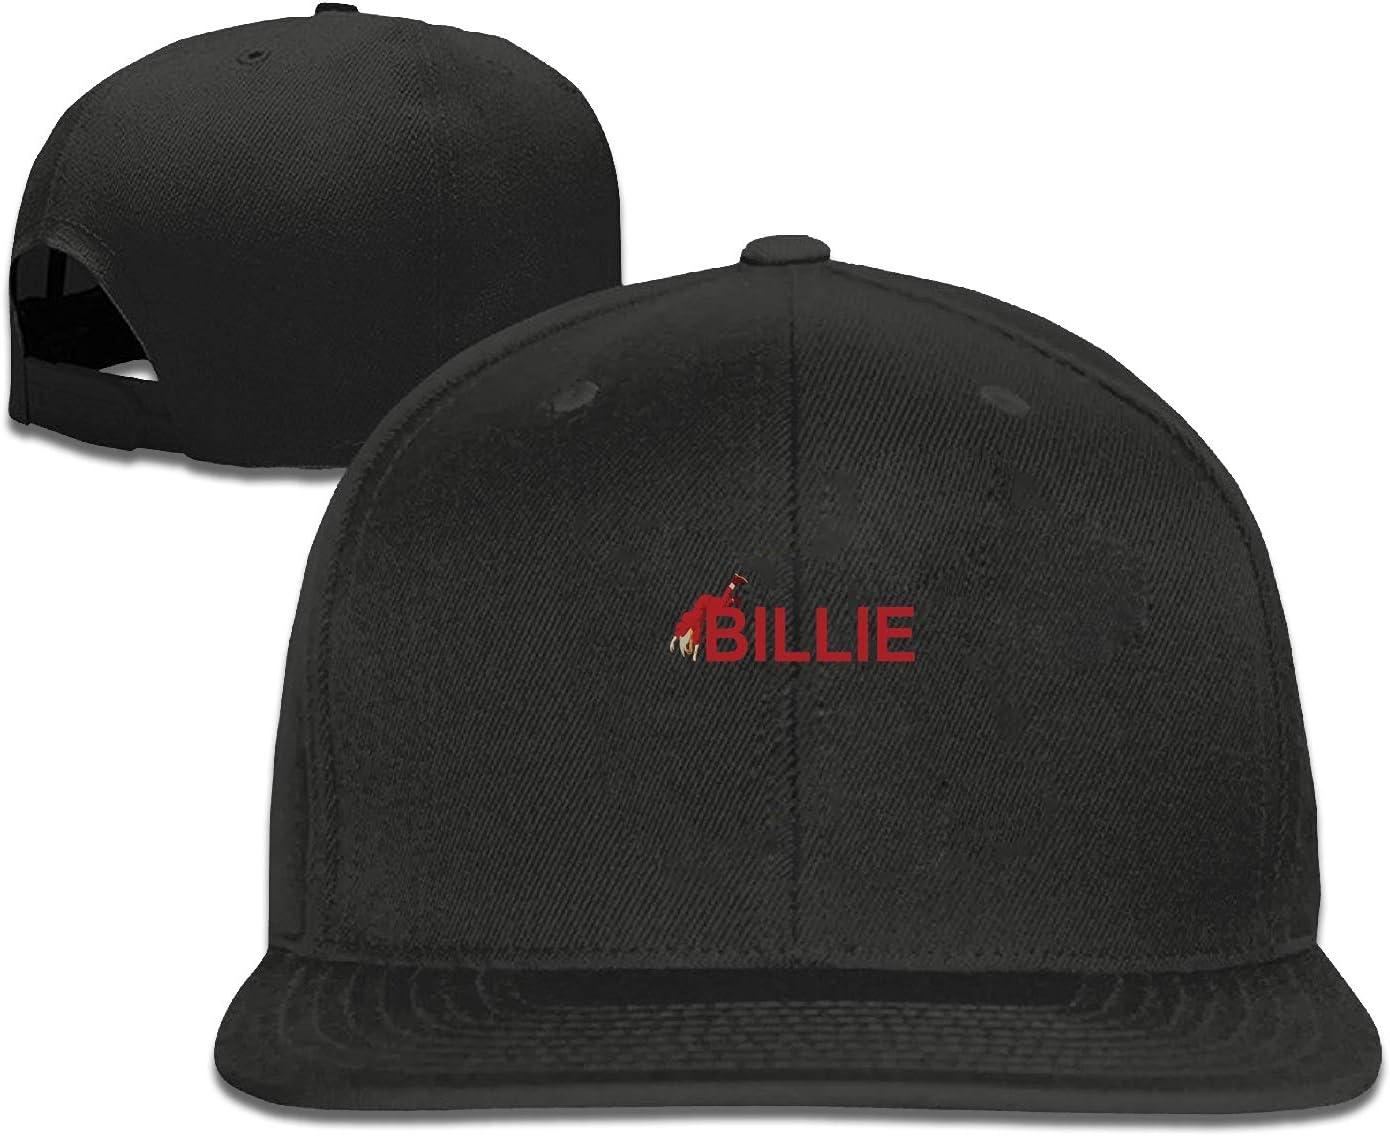 Gorra de Billie Eilish, con Texto en inglés Dont Smile At Me para ...